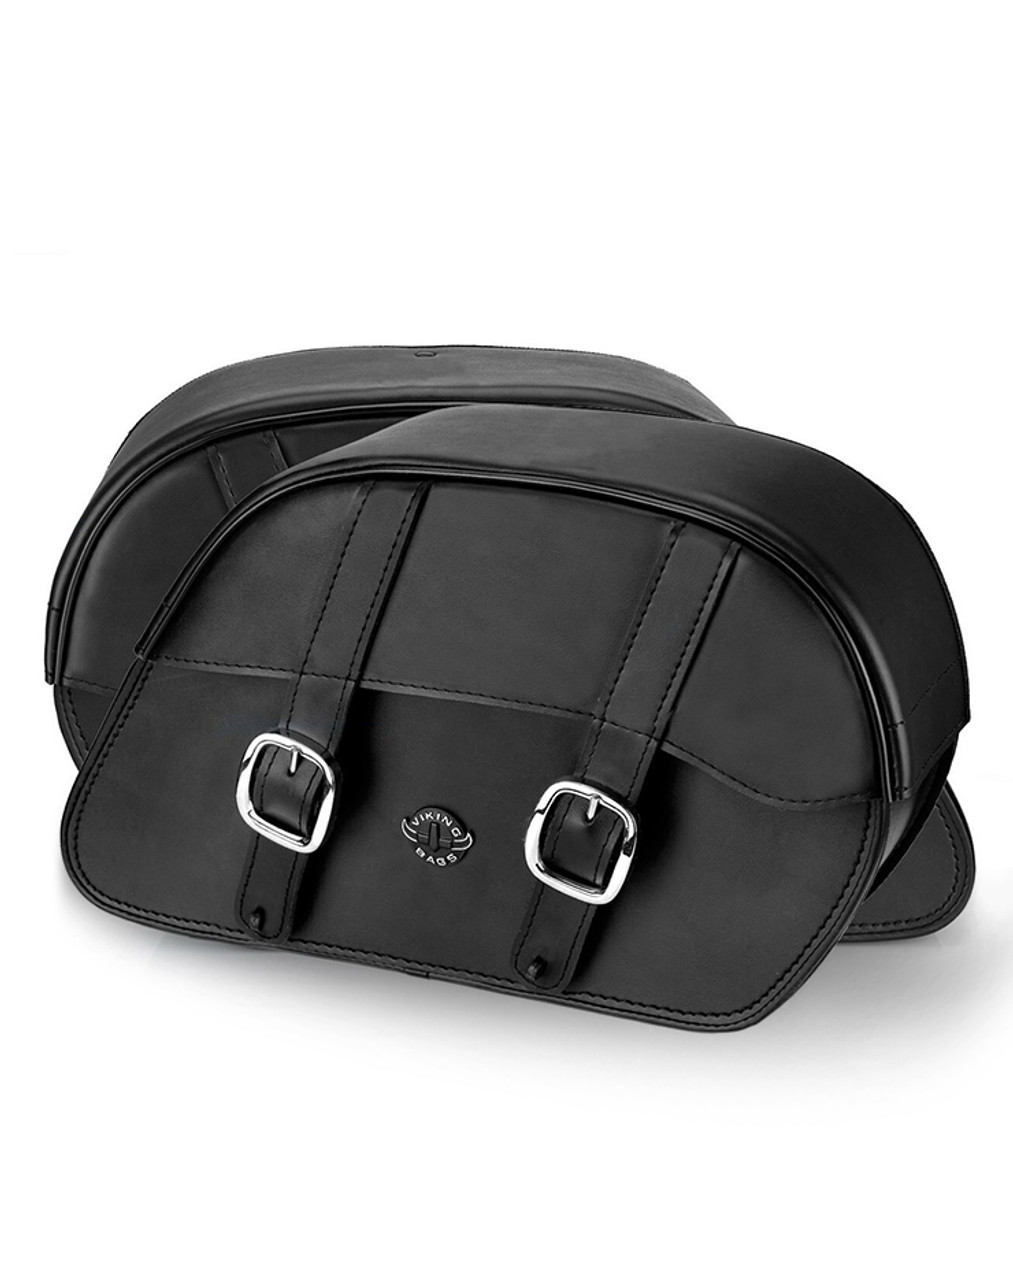 Honda 1100 Shadow Aero Slant Medium Motorcycle Saddlebags Both Bags View